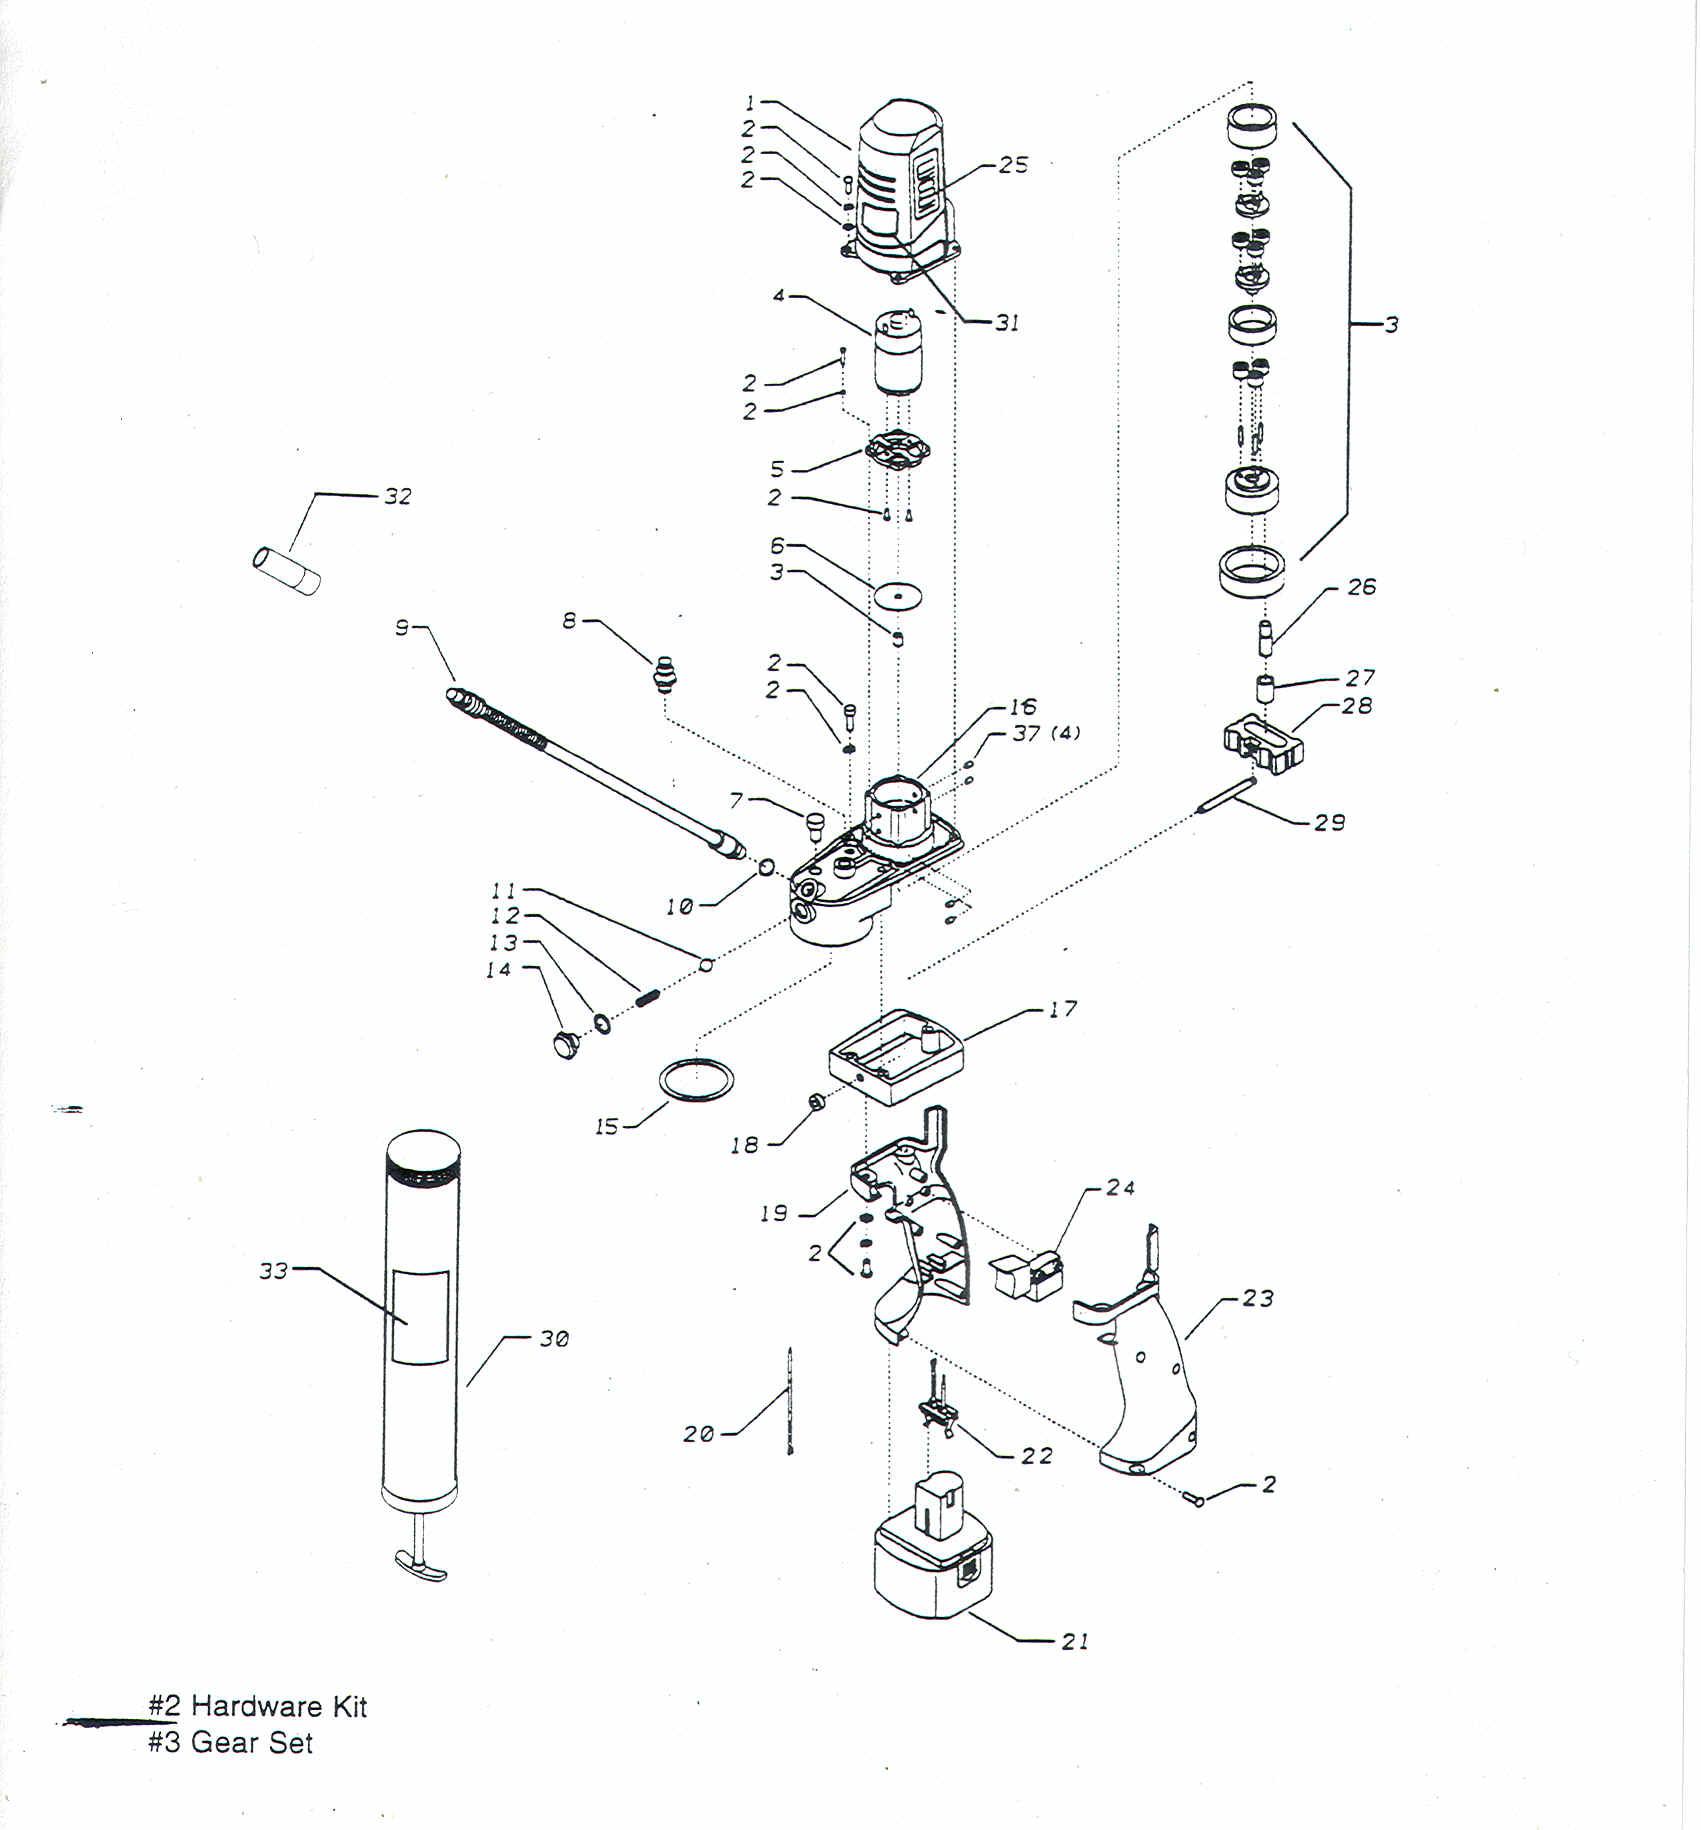 1205_power_luber_schematic.tif (9390692 bytes)